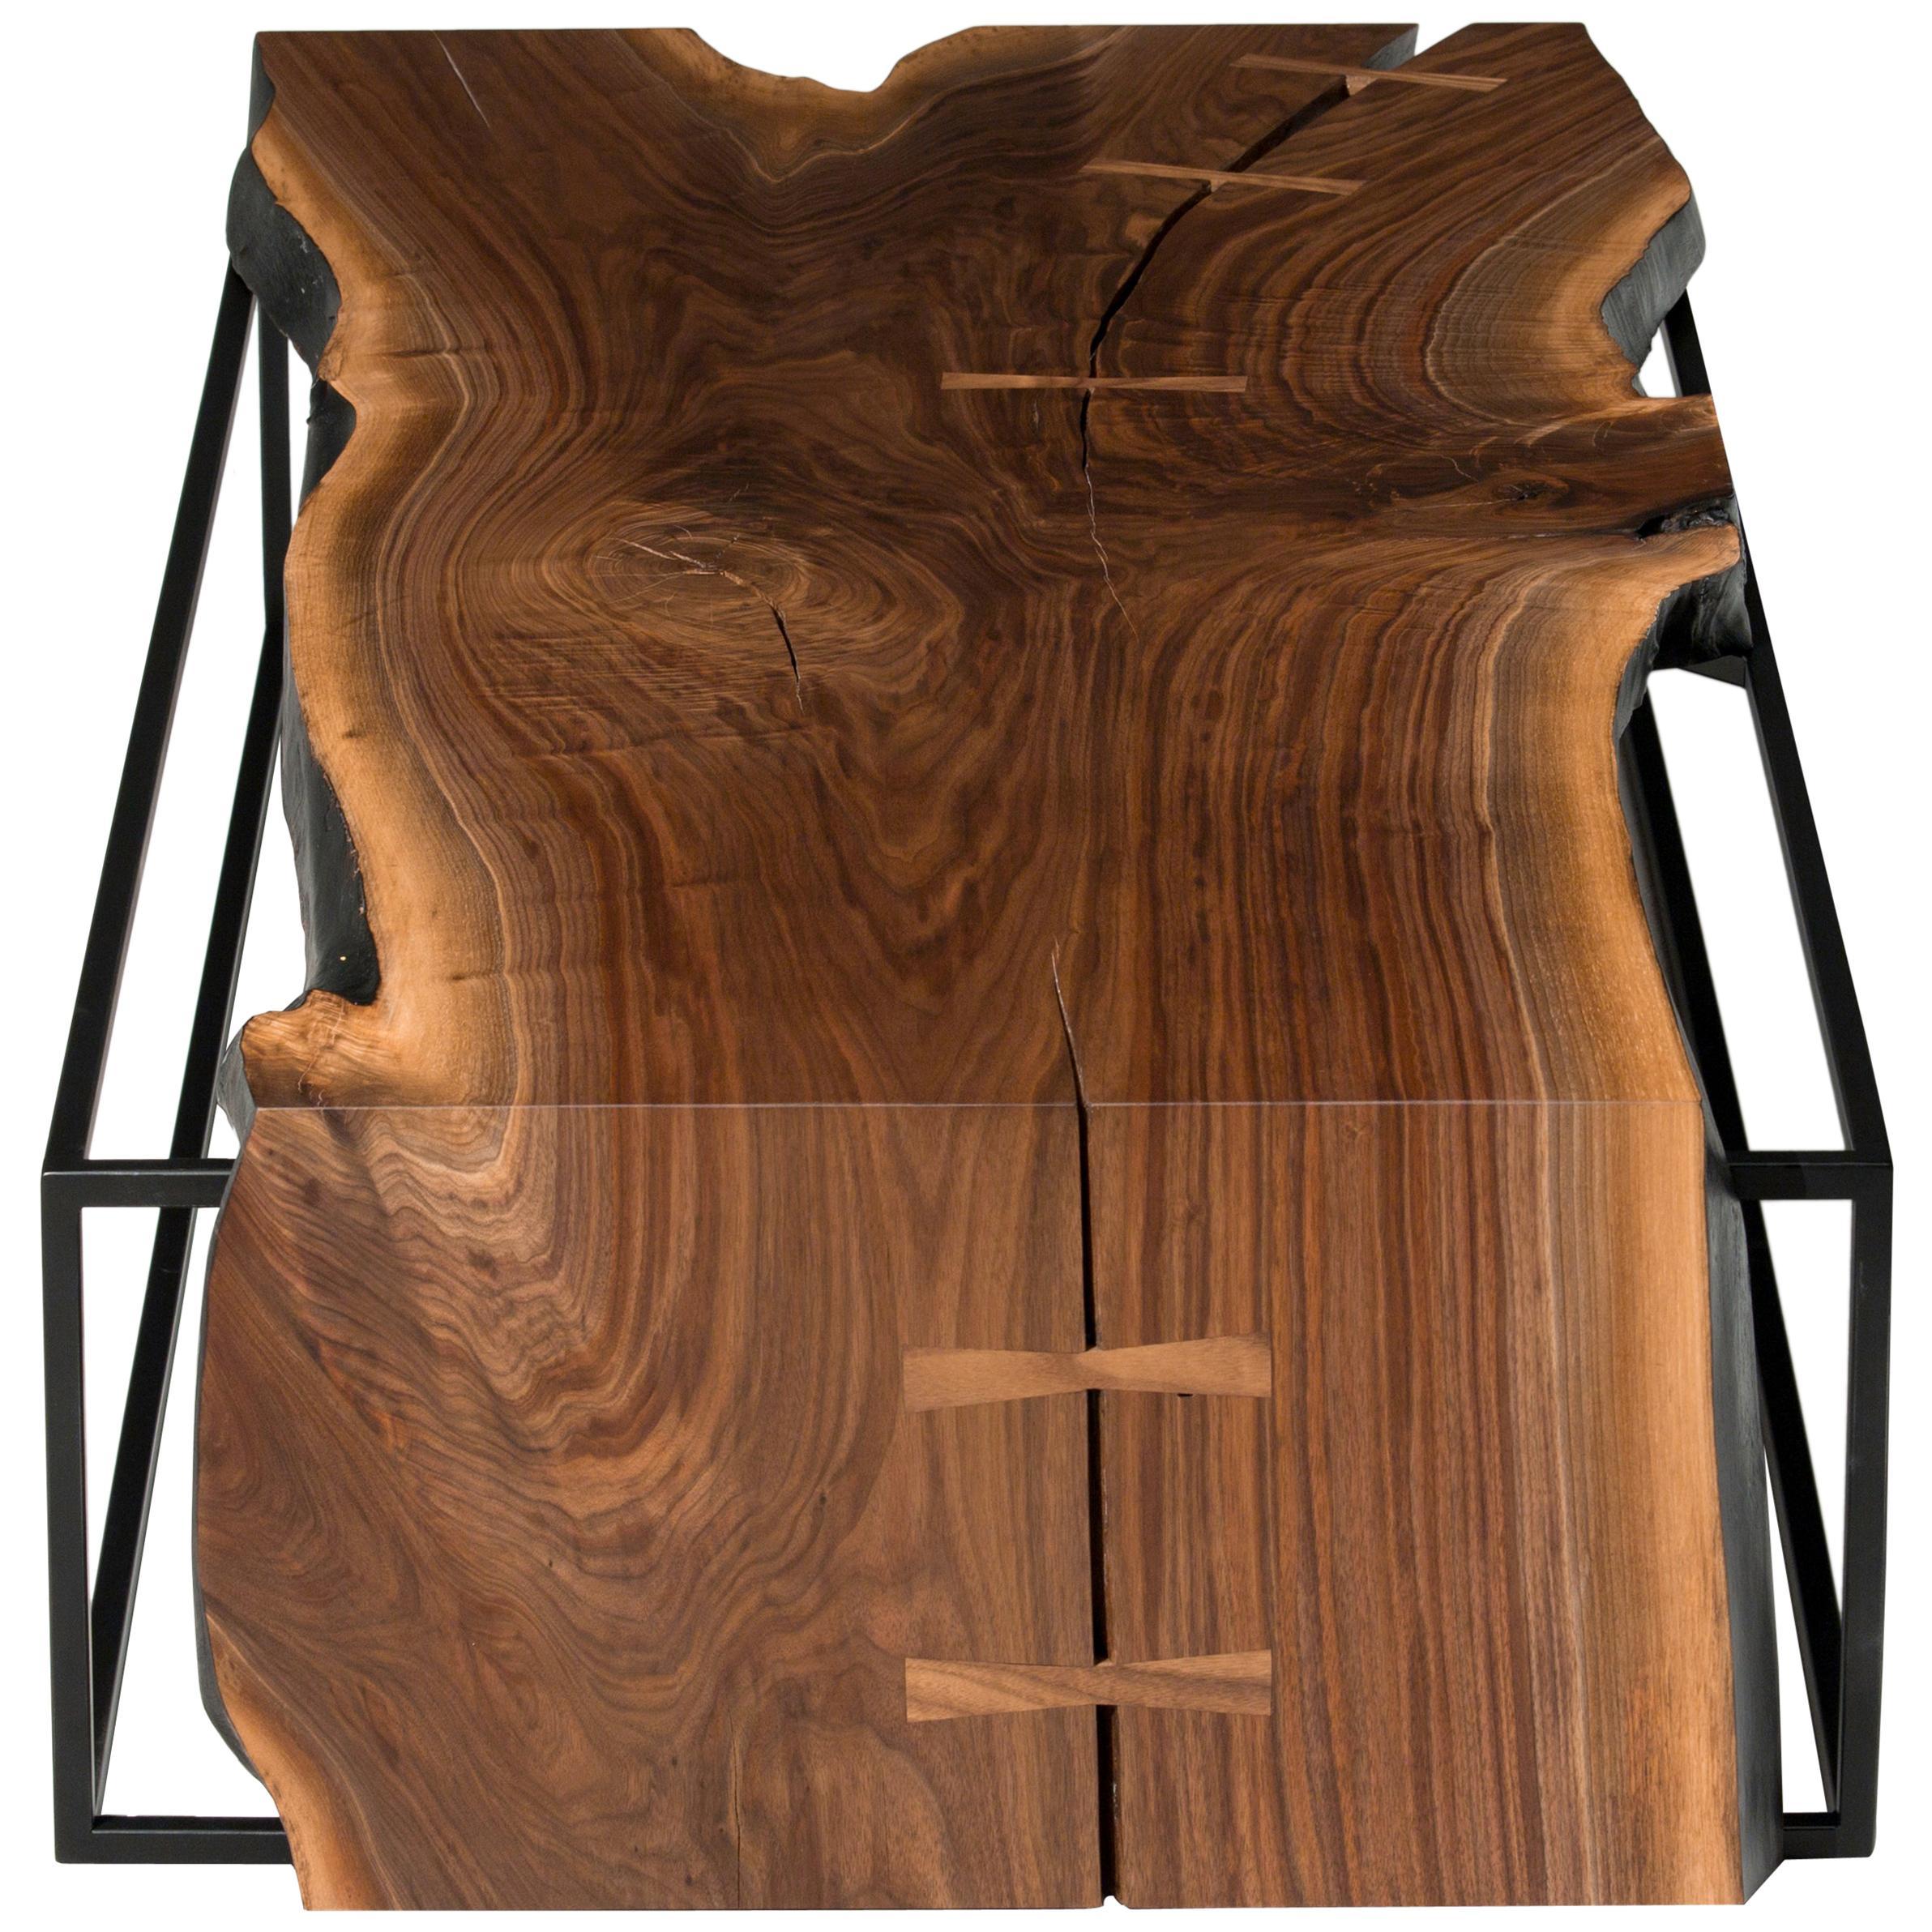 "Live Edge Walnut Slab Coffee Table on Matte Black Base ""Farnsworth Coffee Table"""